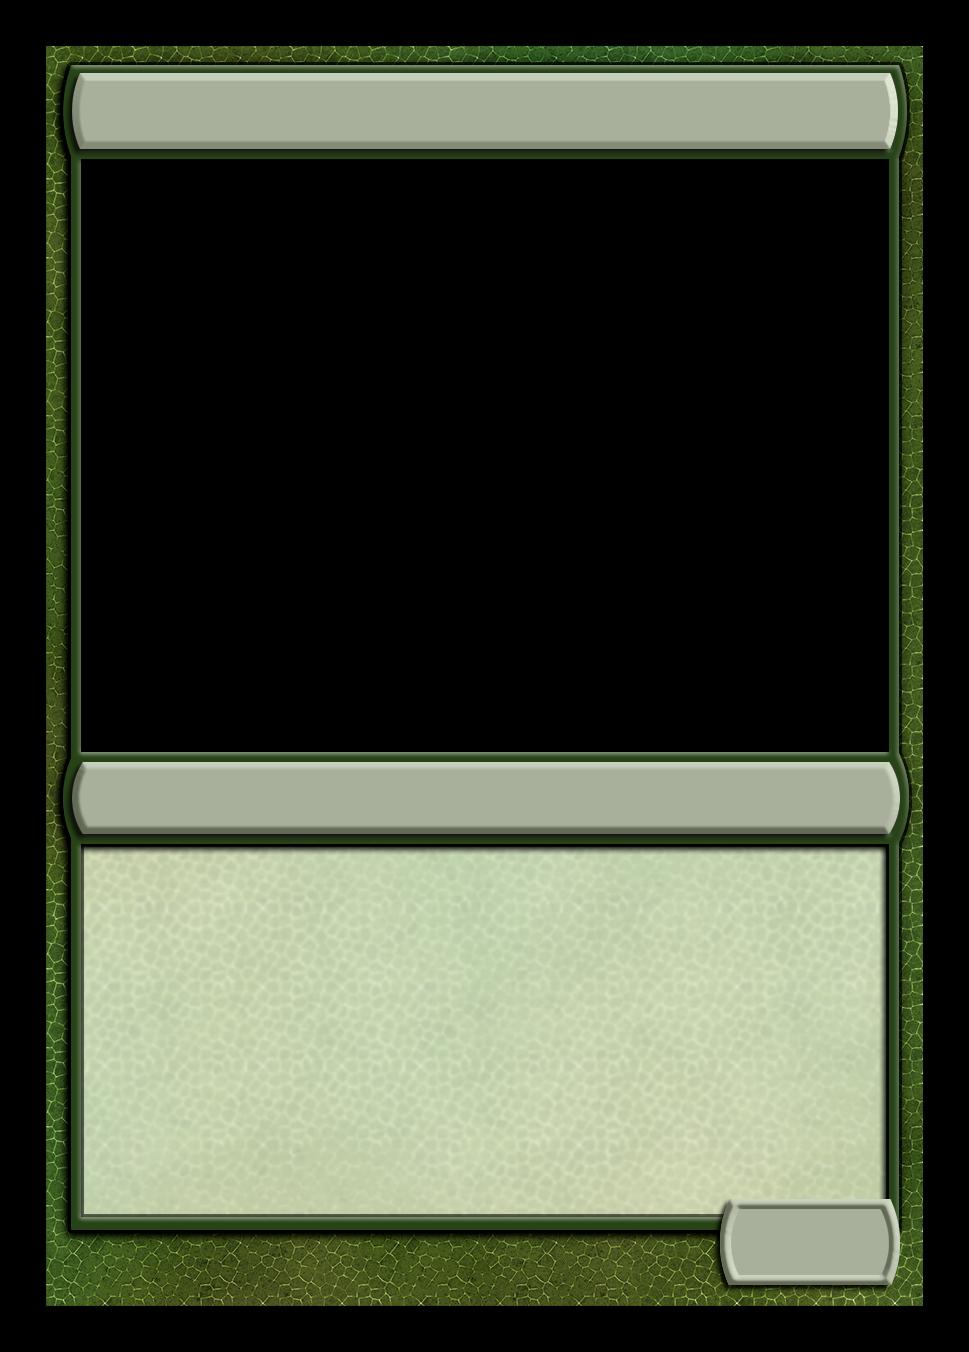 Printable Magic The Gathering Card Template - meditacaonavidareal For Blank Magic Card Template